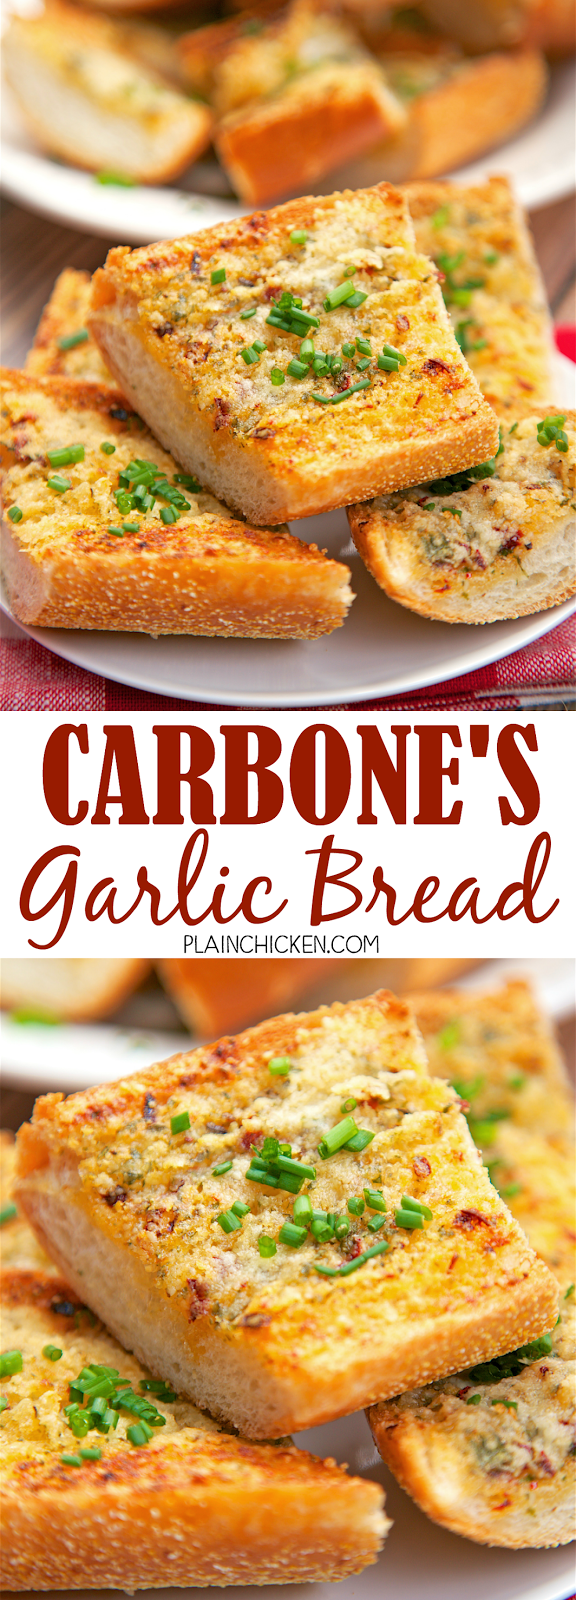 Carbone's Garlic Bread recipe for the garlic bread from